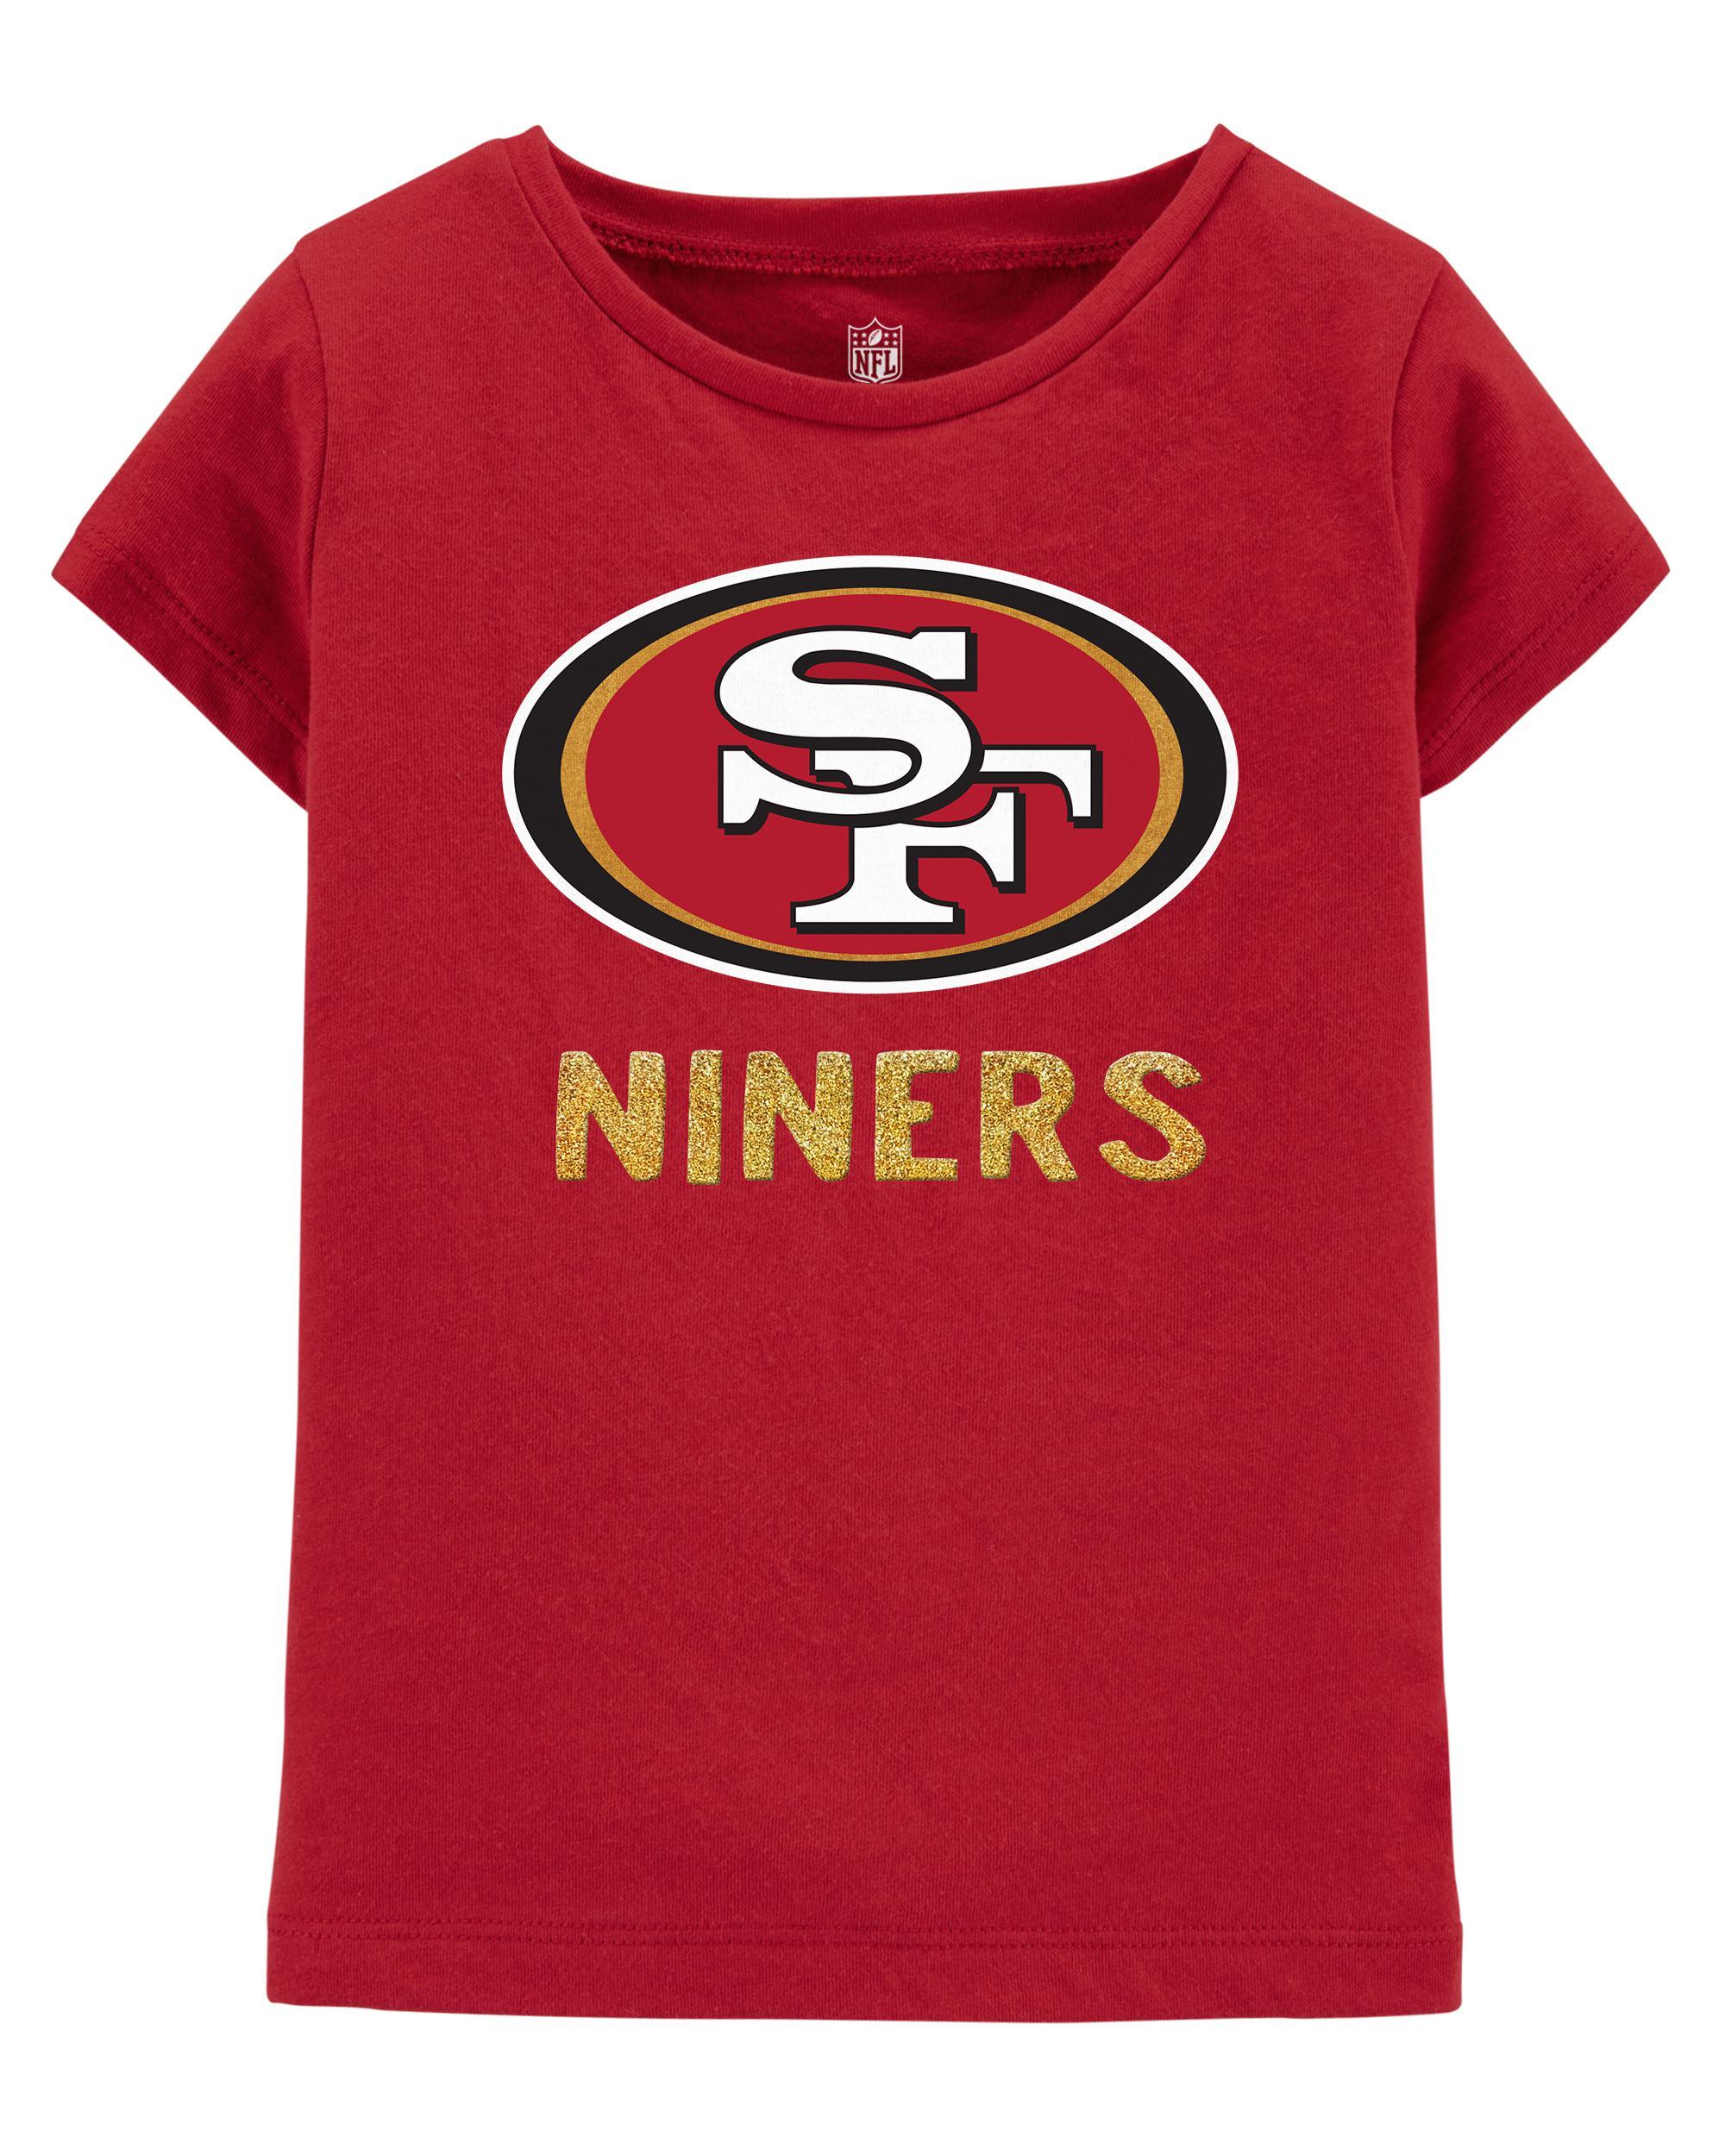 check out d8663 873d1 NFL San Francisco 49ers Glitter Tee | oshkosh.com